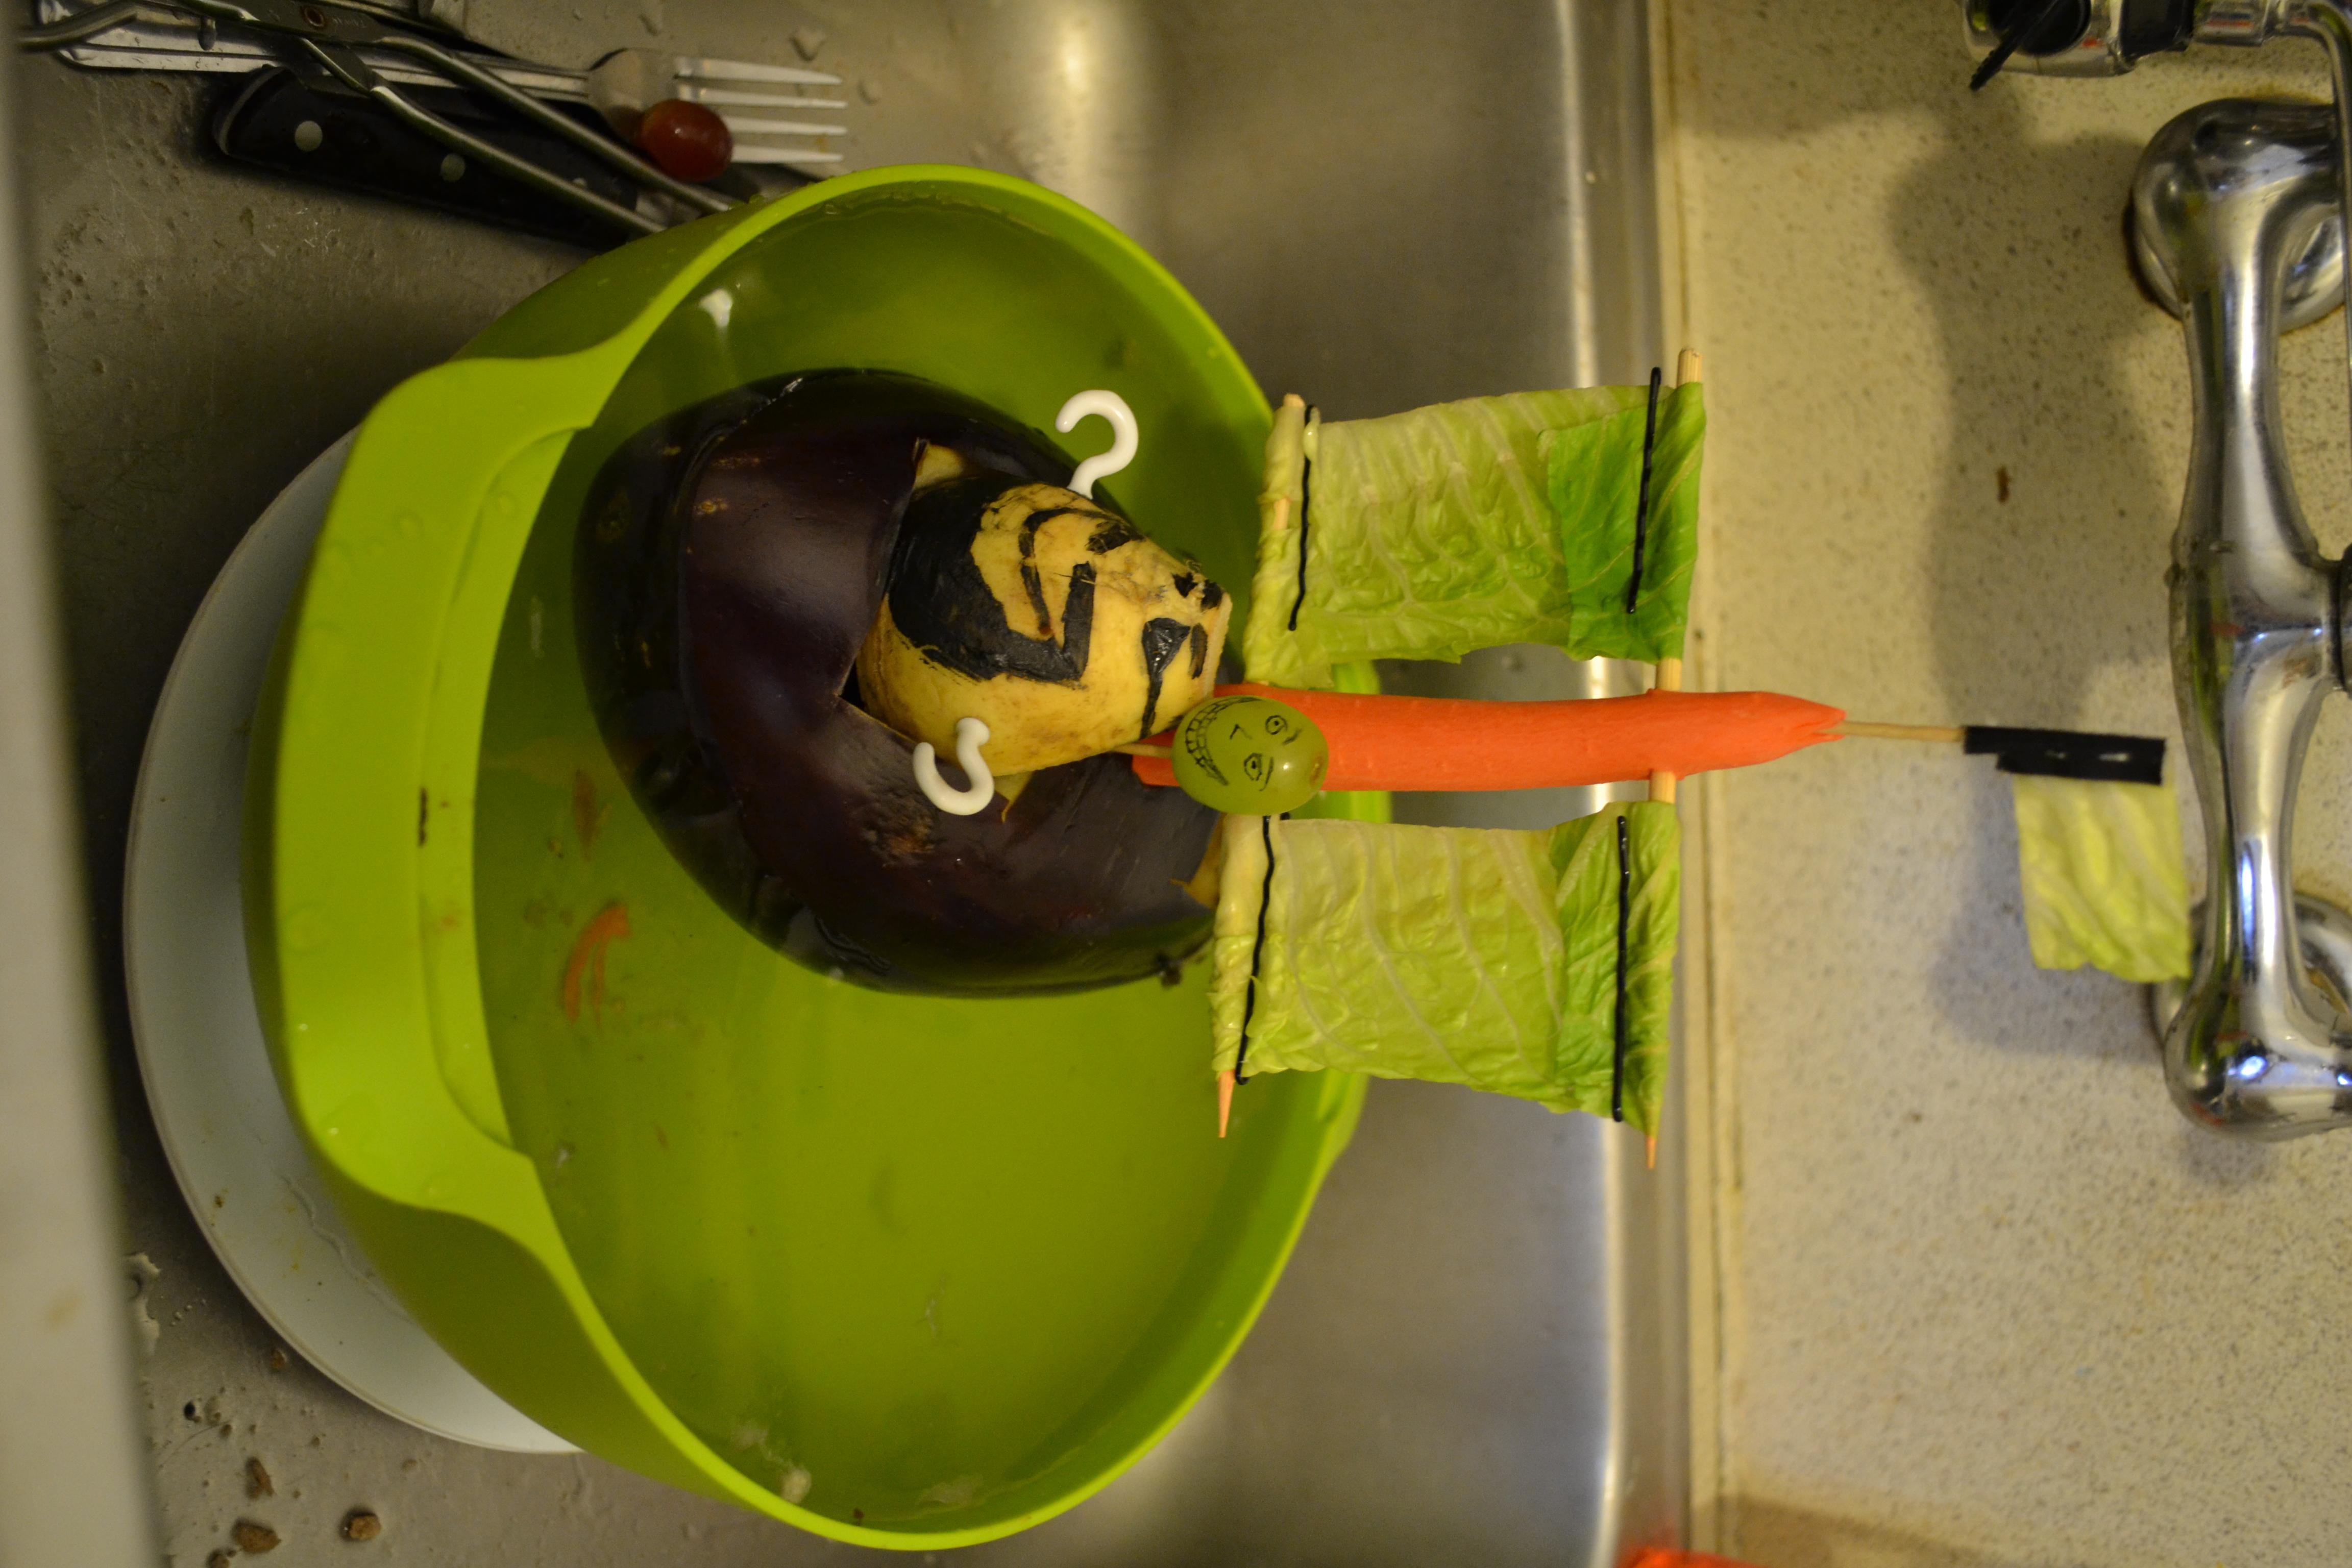 3. Eggplant Boat